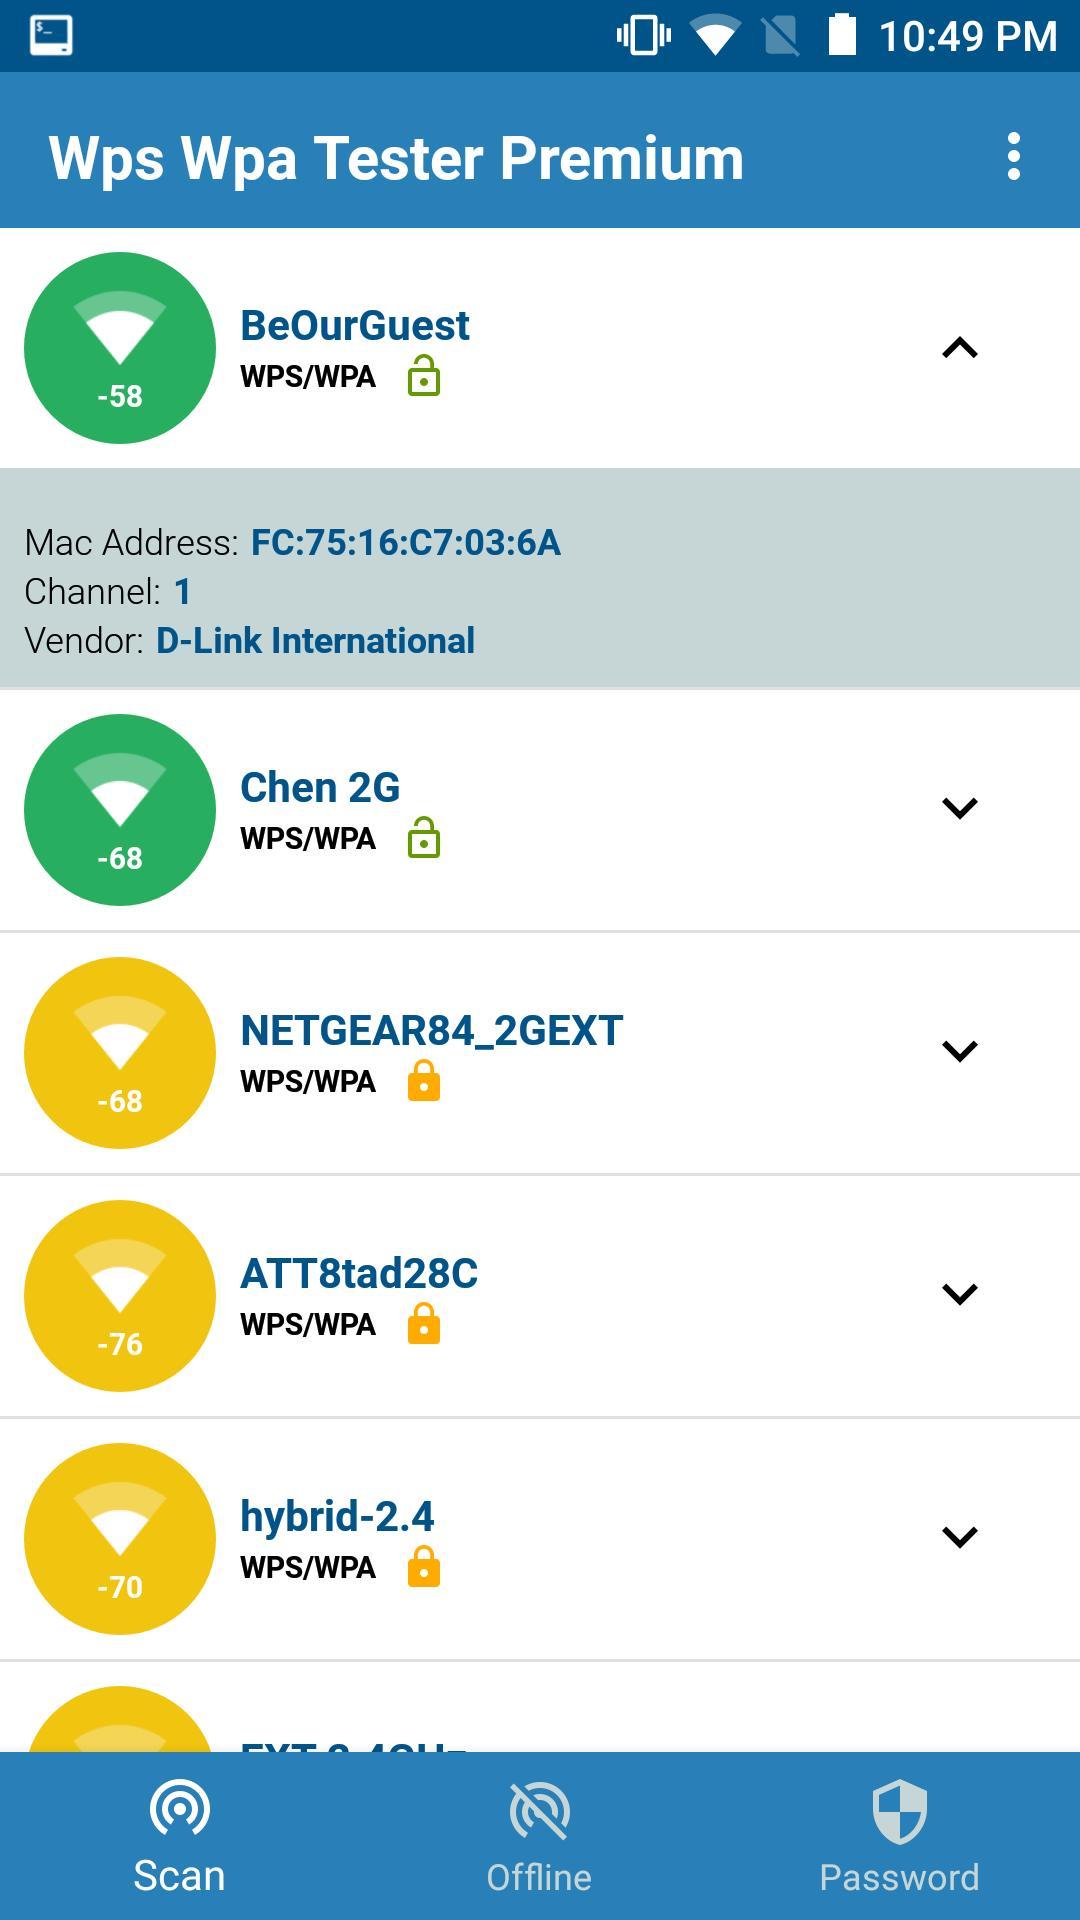 Aplikasi-Wi-Fi-WPS-WPA-Tester